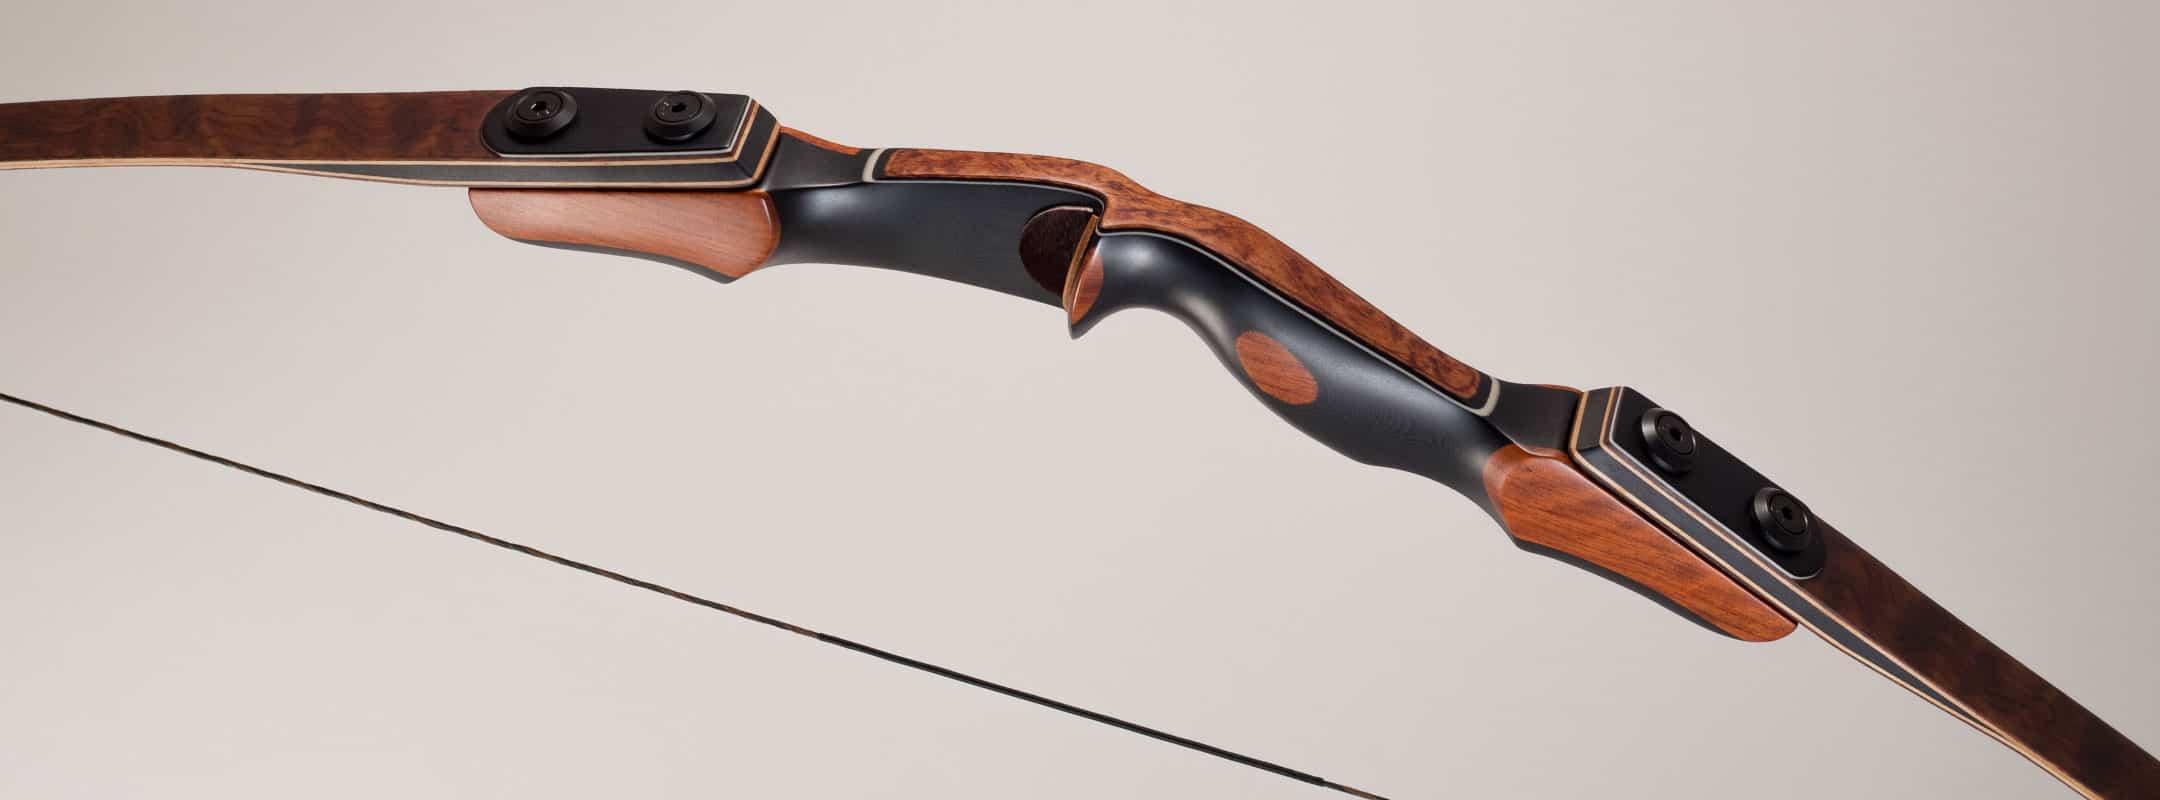 Longbow handle showing exotic veneer overlay